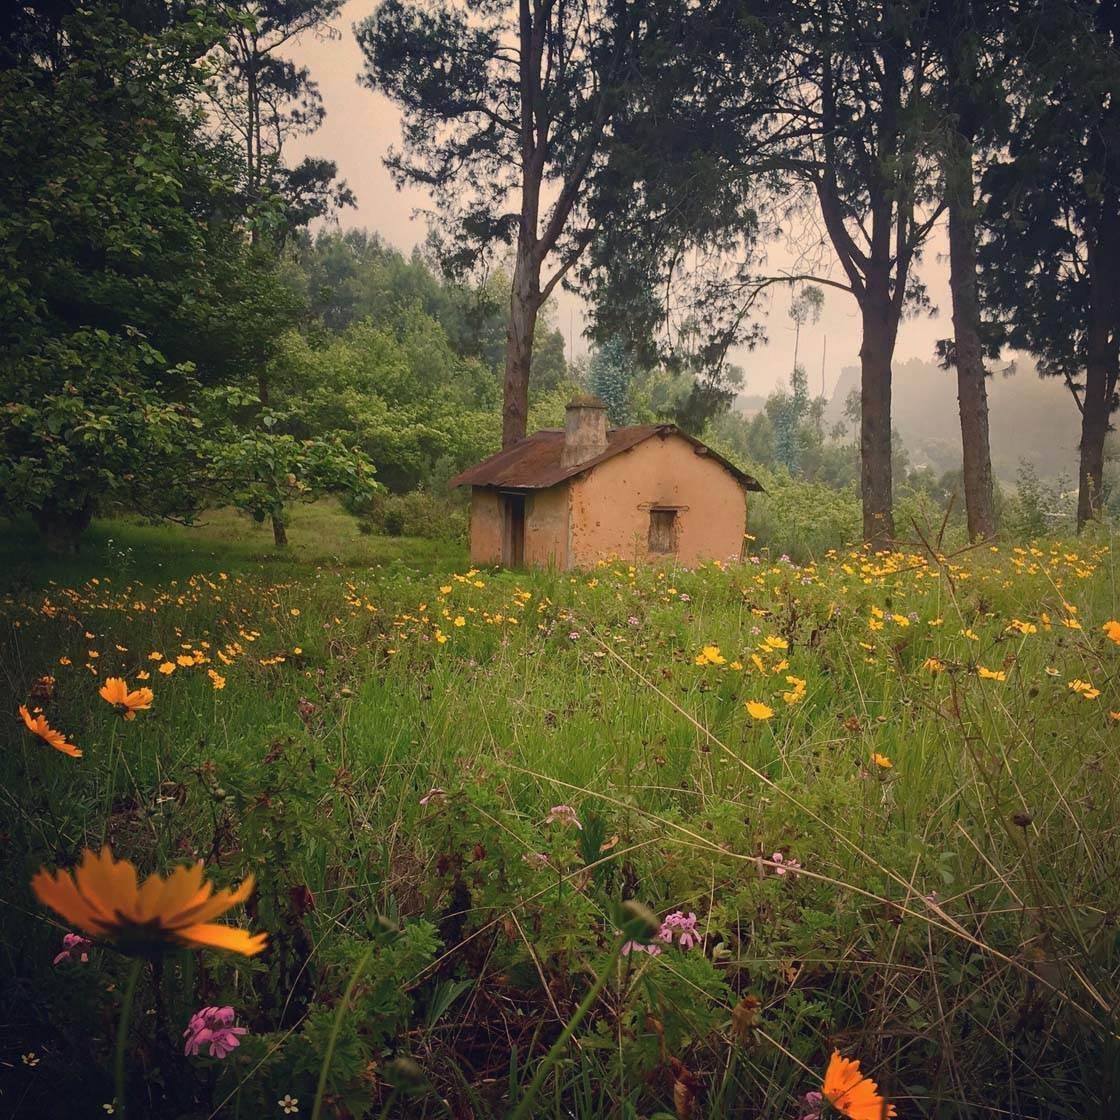 Landscapes iPhone Photos 21 no script